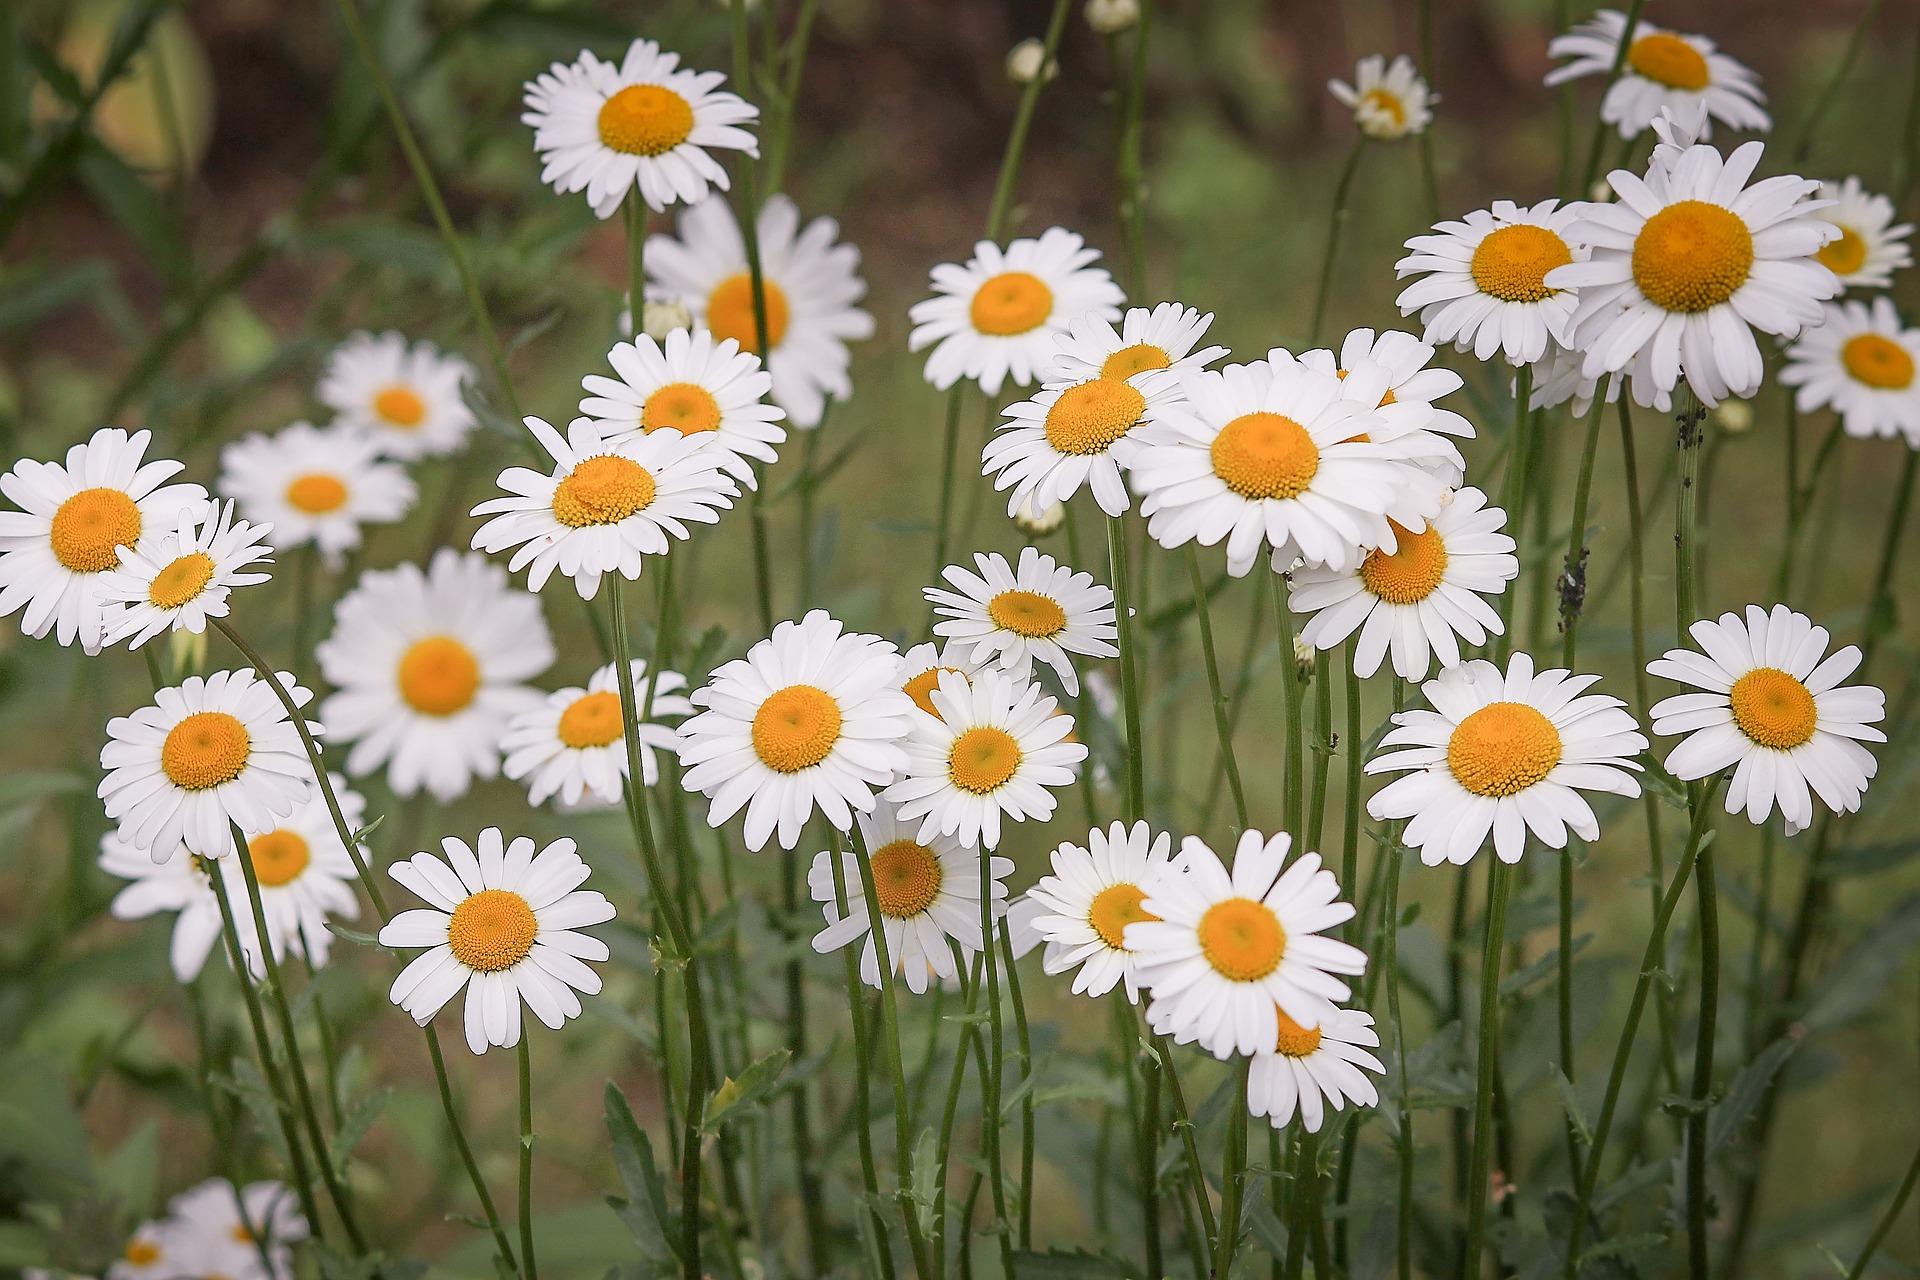 daisies-3439573_1920